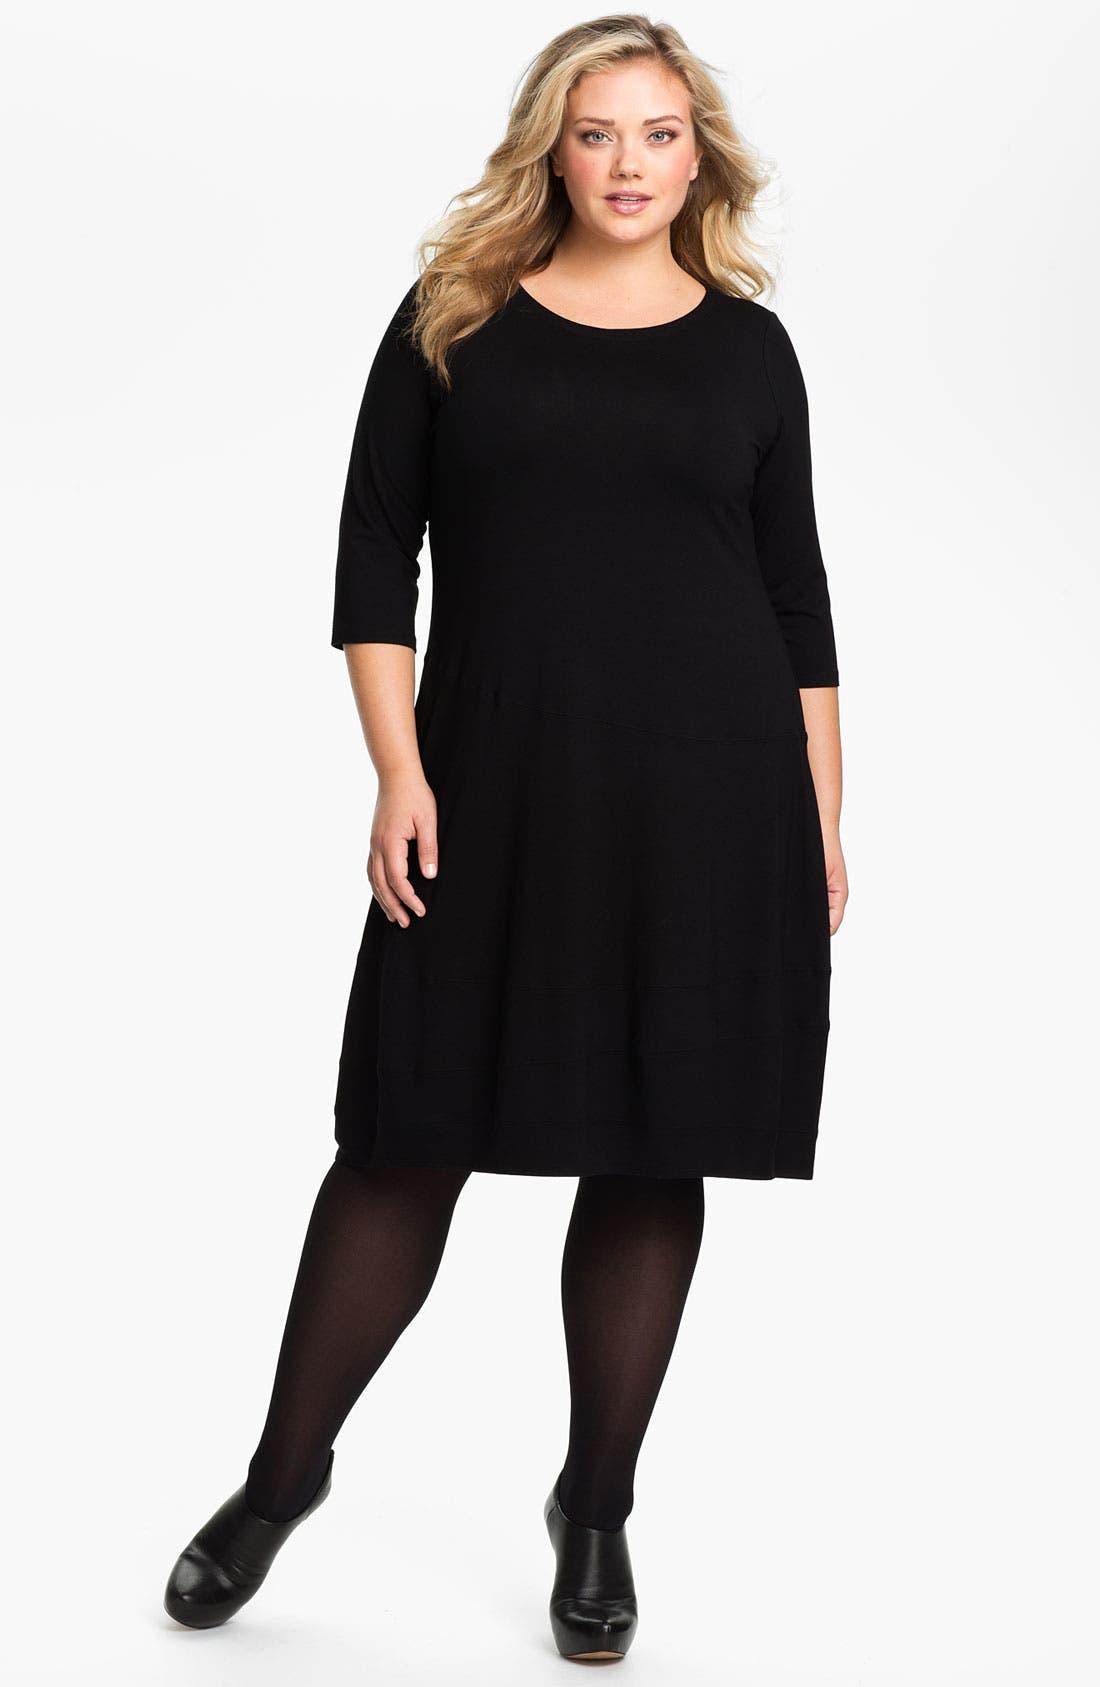 Main Image - Eileen Fisher Scoop Neck Knit Dress (Plus)